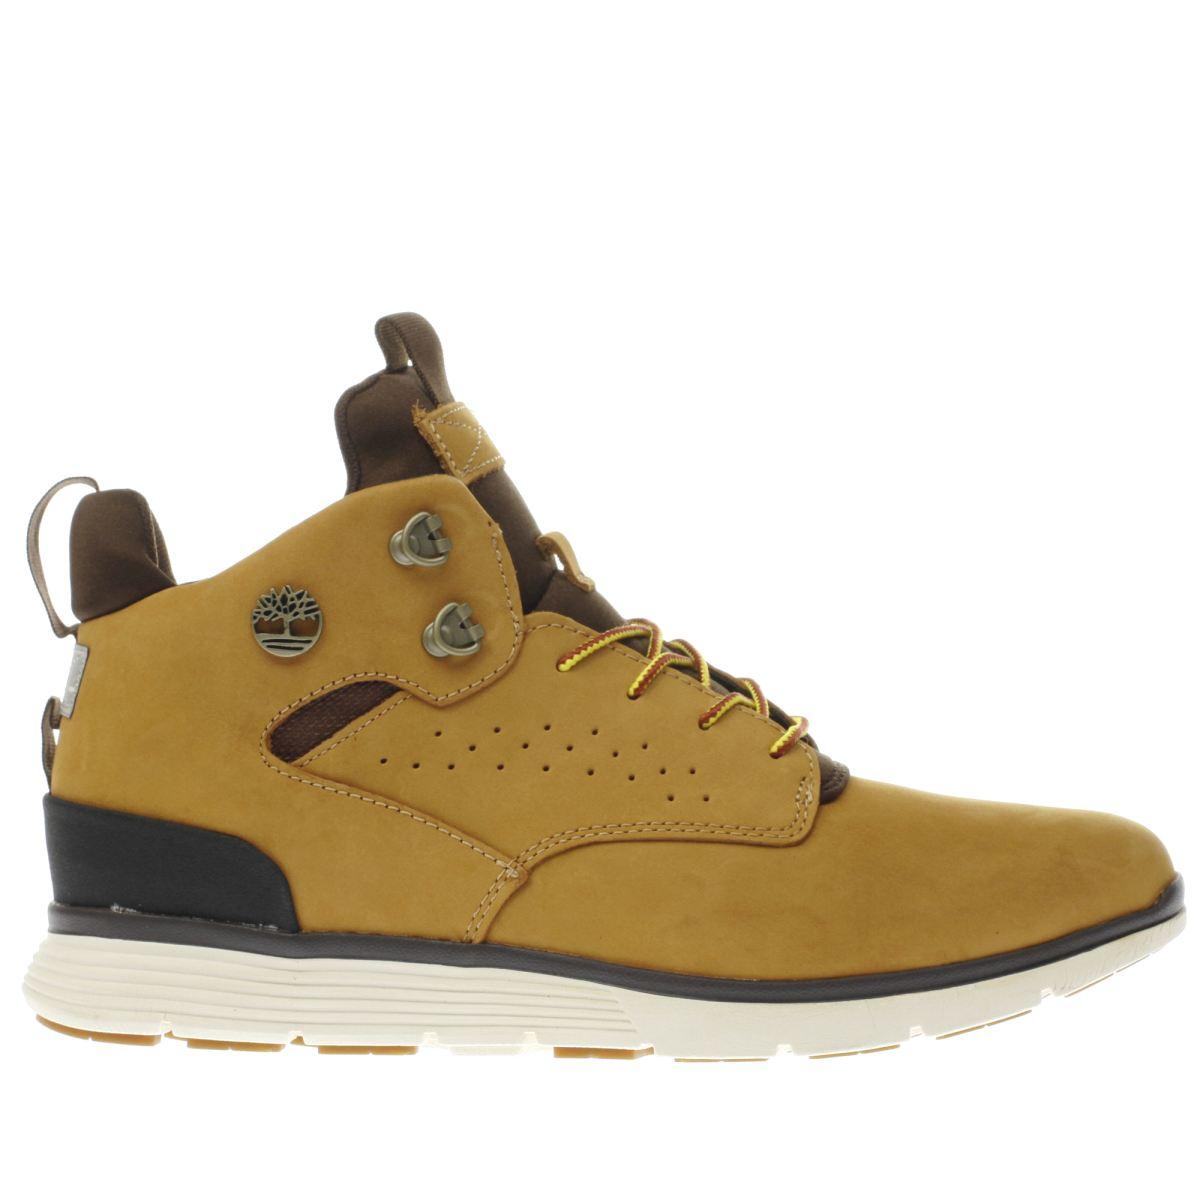 timberland tan killington boots